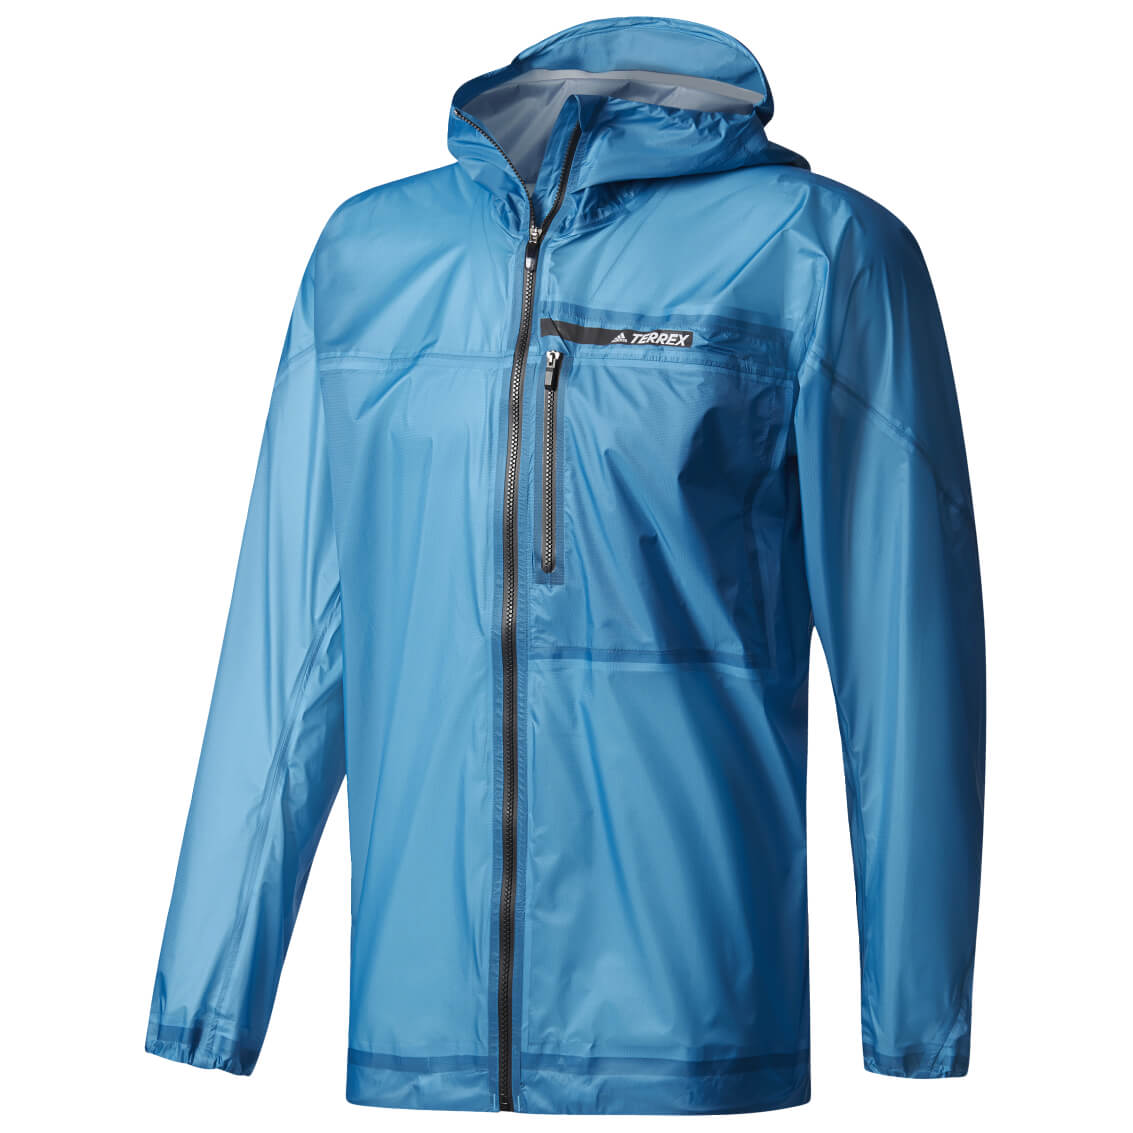 Adidas Terrex Agravic 3L Jacket Waterproof jacket Men's